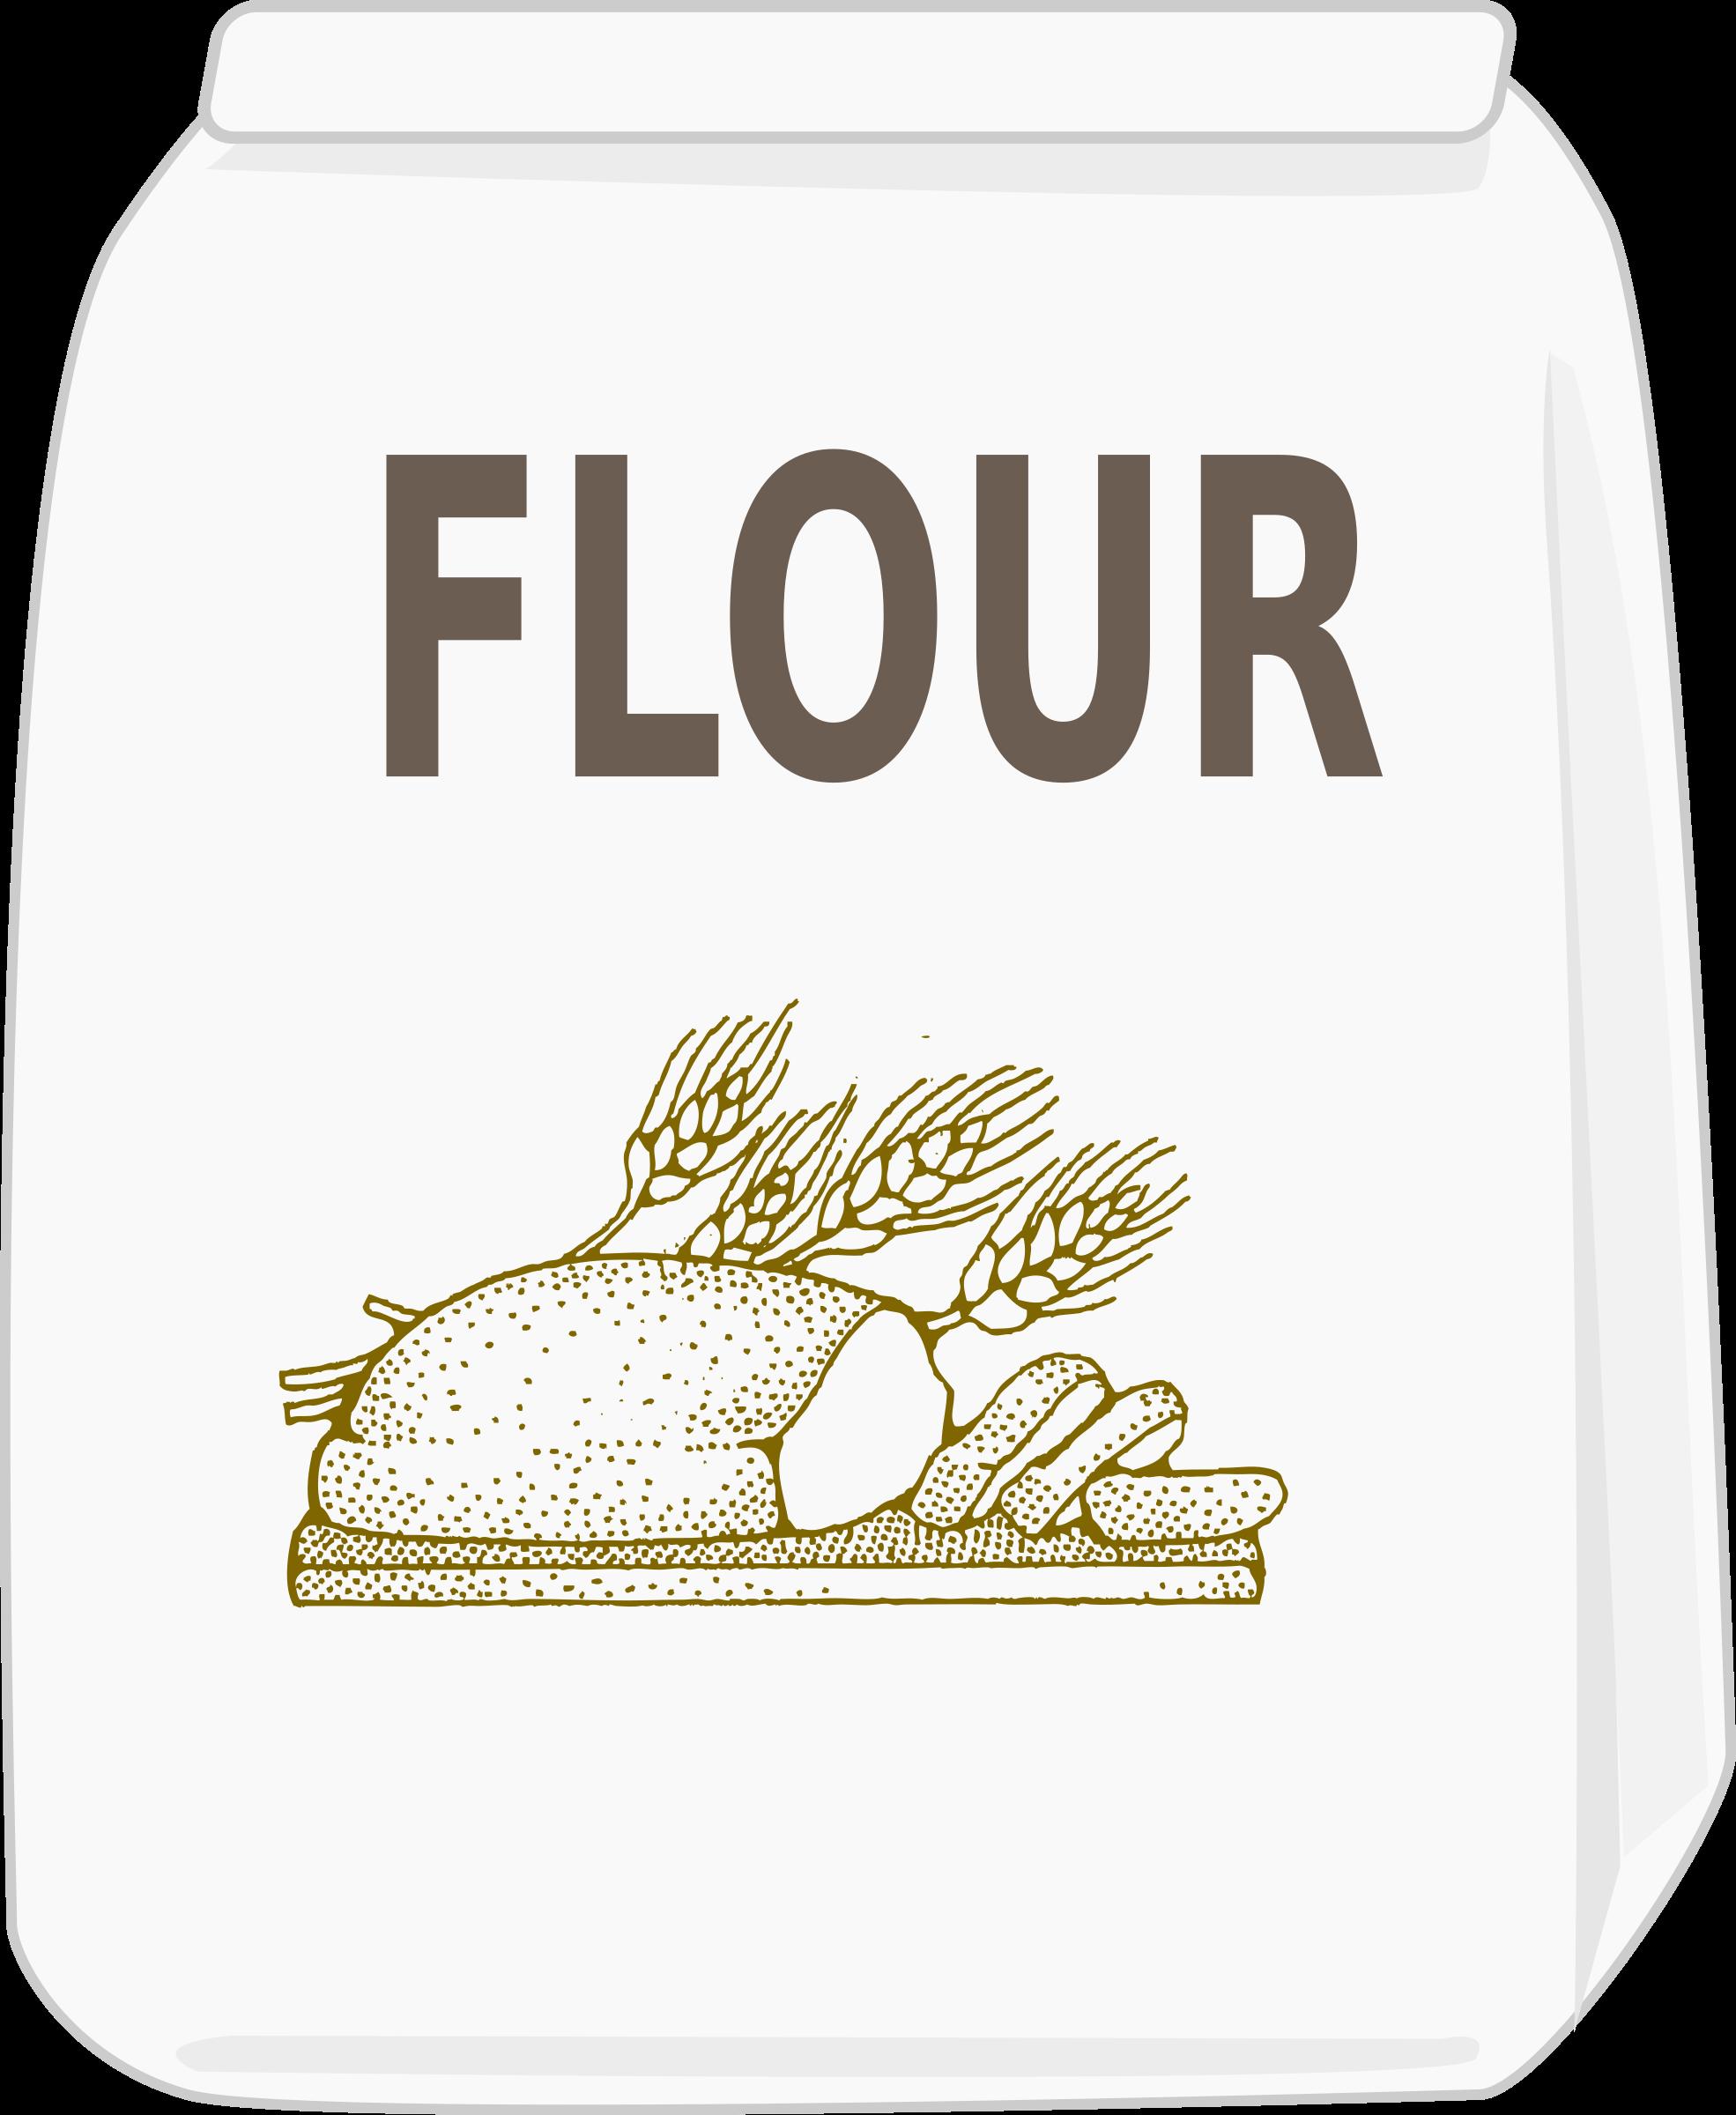 Flour clipart free download clip art on 5